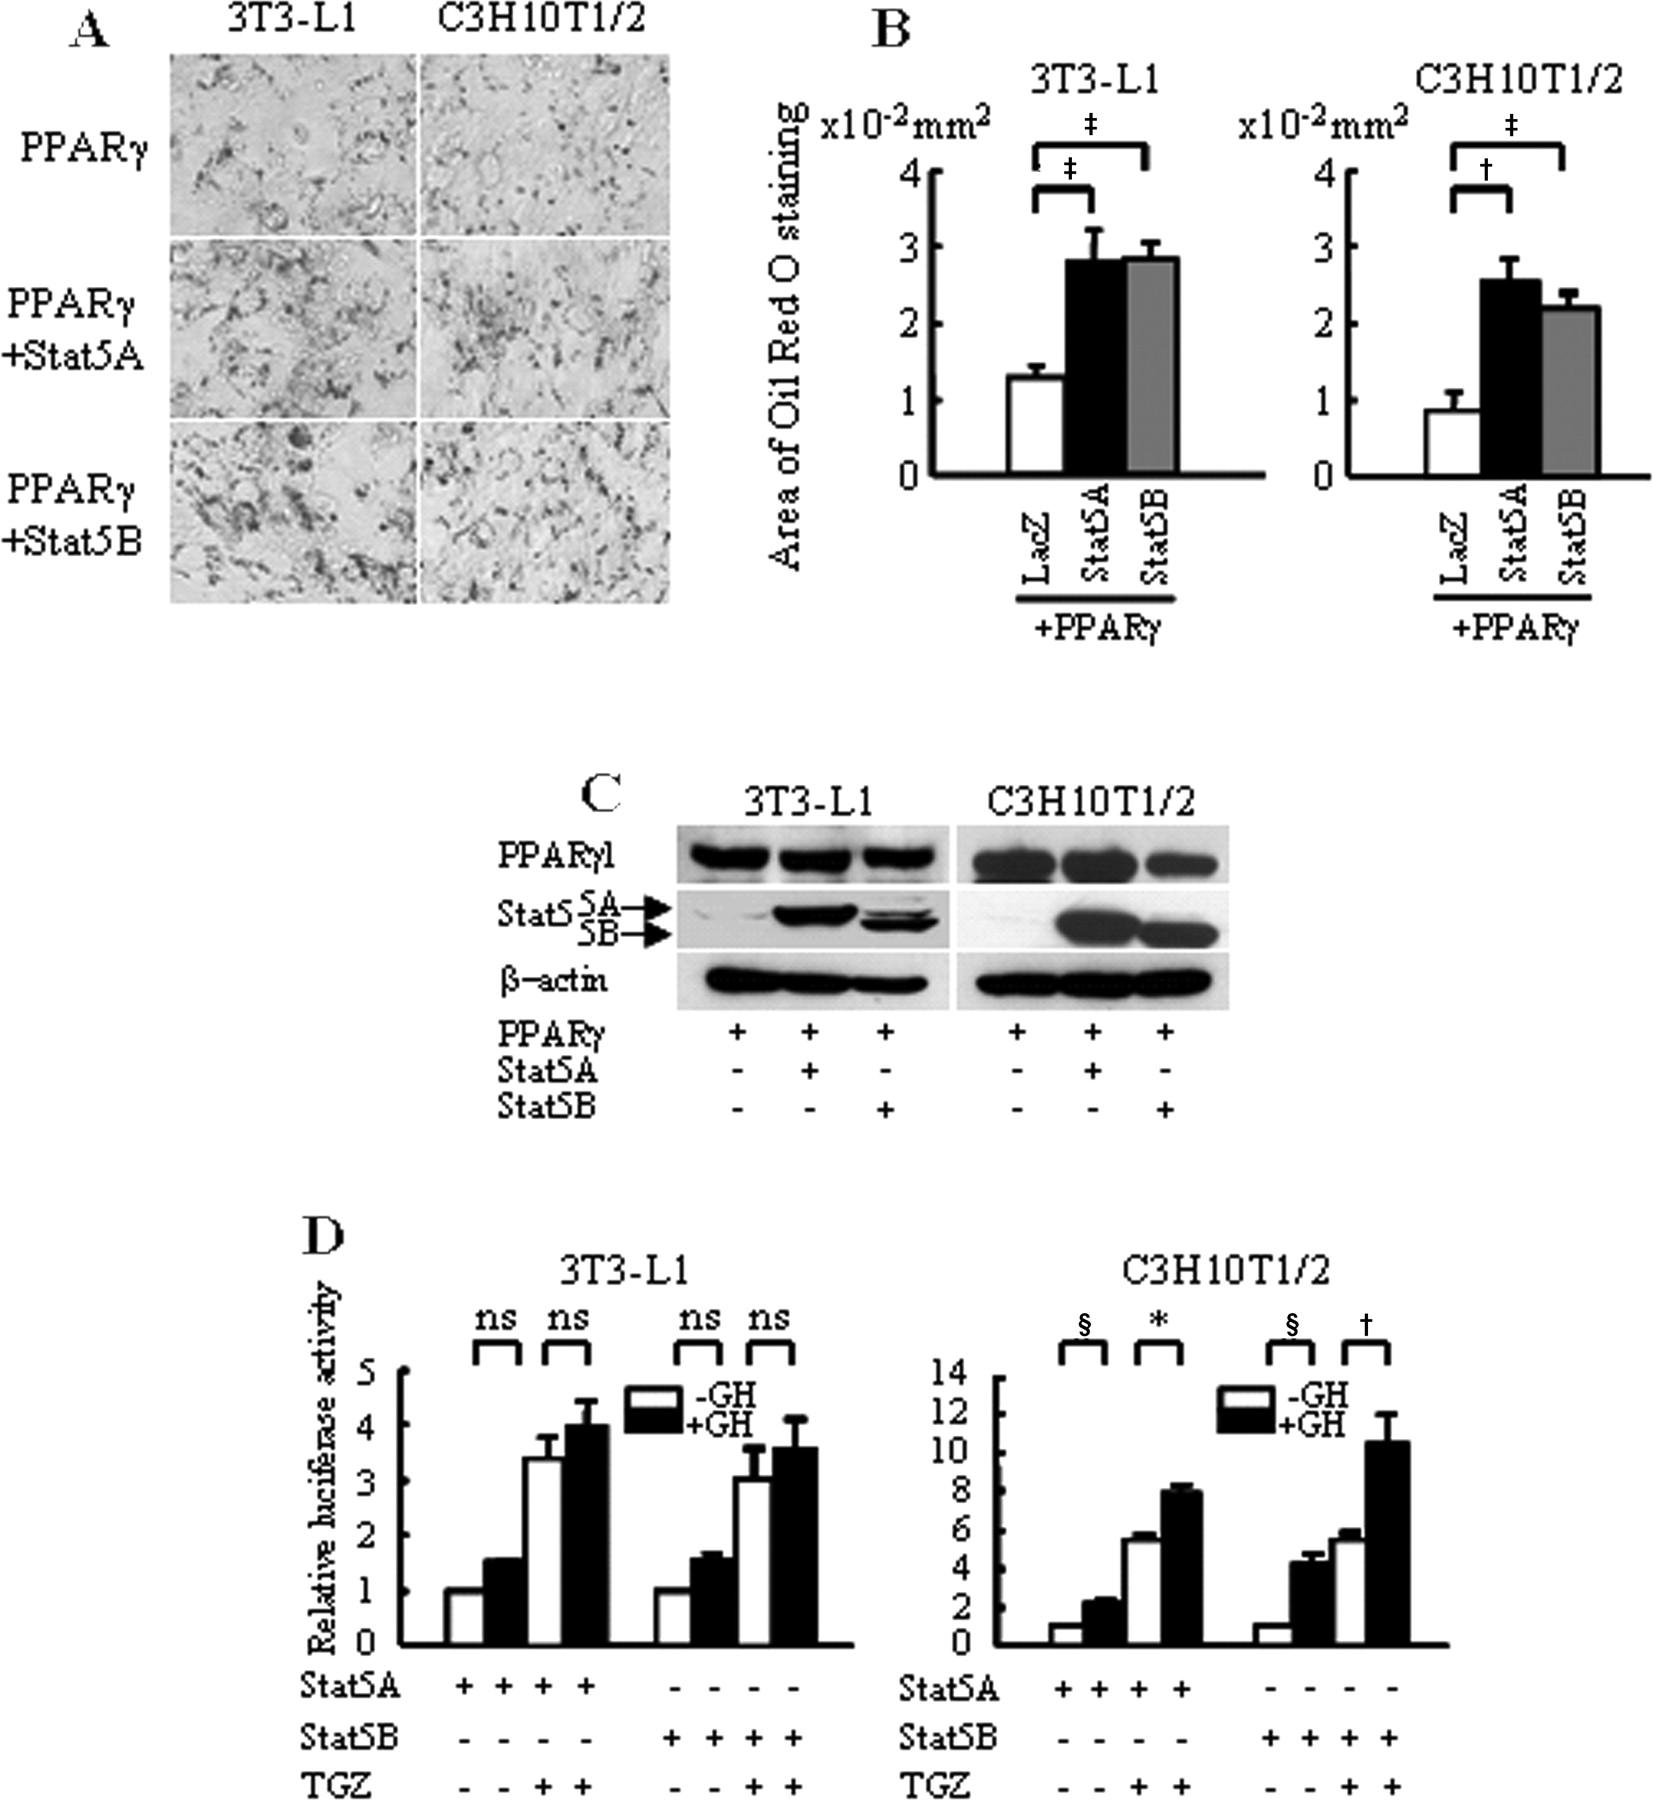 Growth hormone stimulates adipogenesis of 3T3-L1 cells through